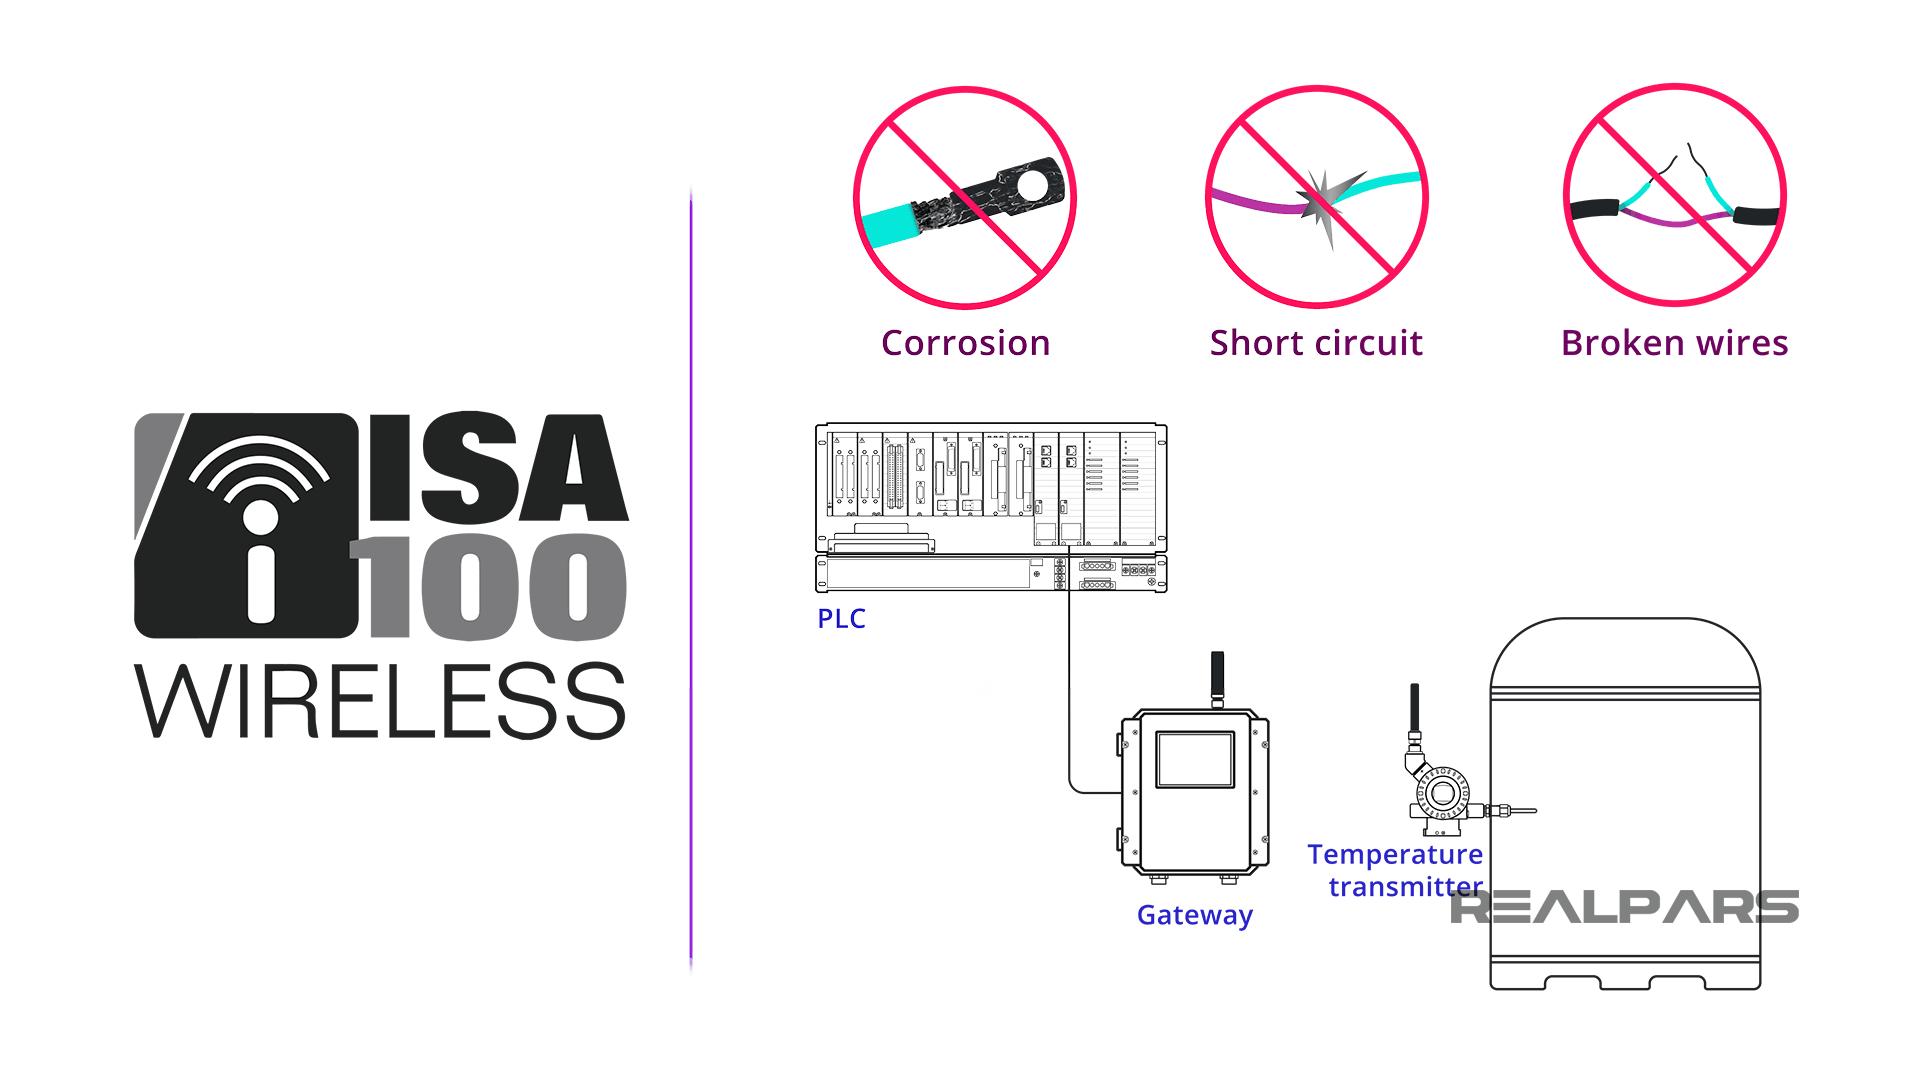 Introducing ISA100 Wireless